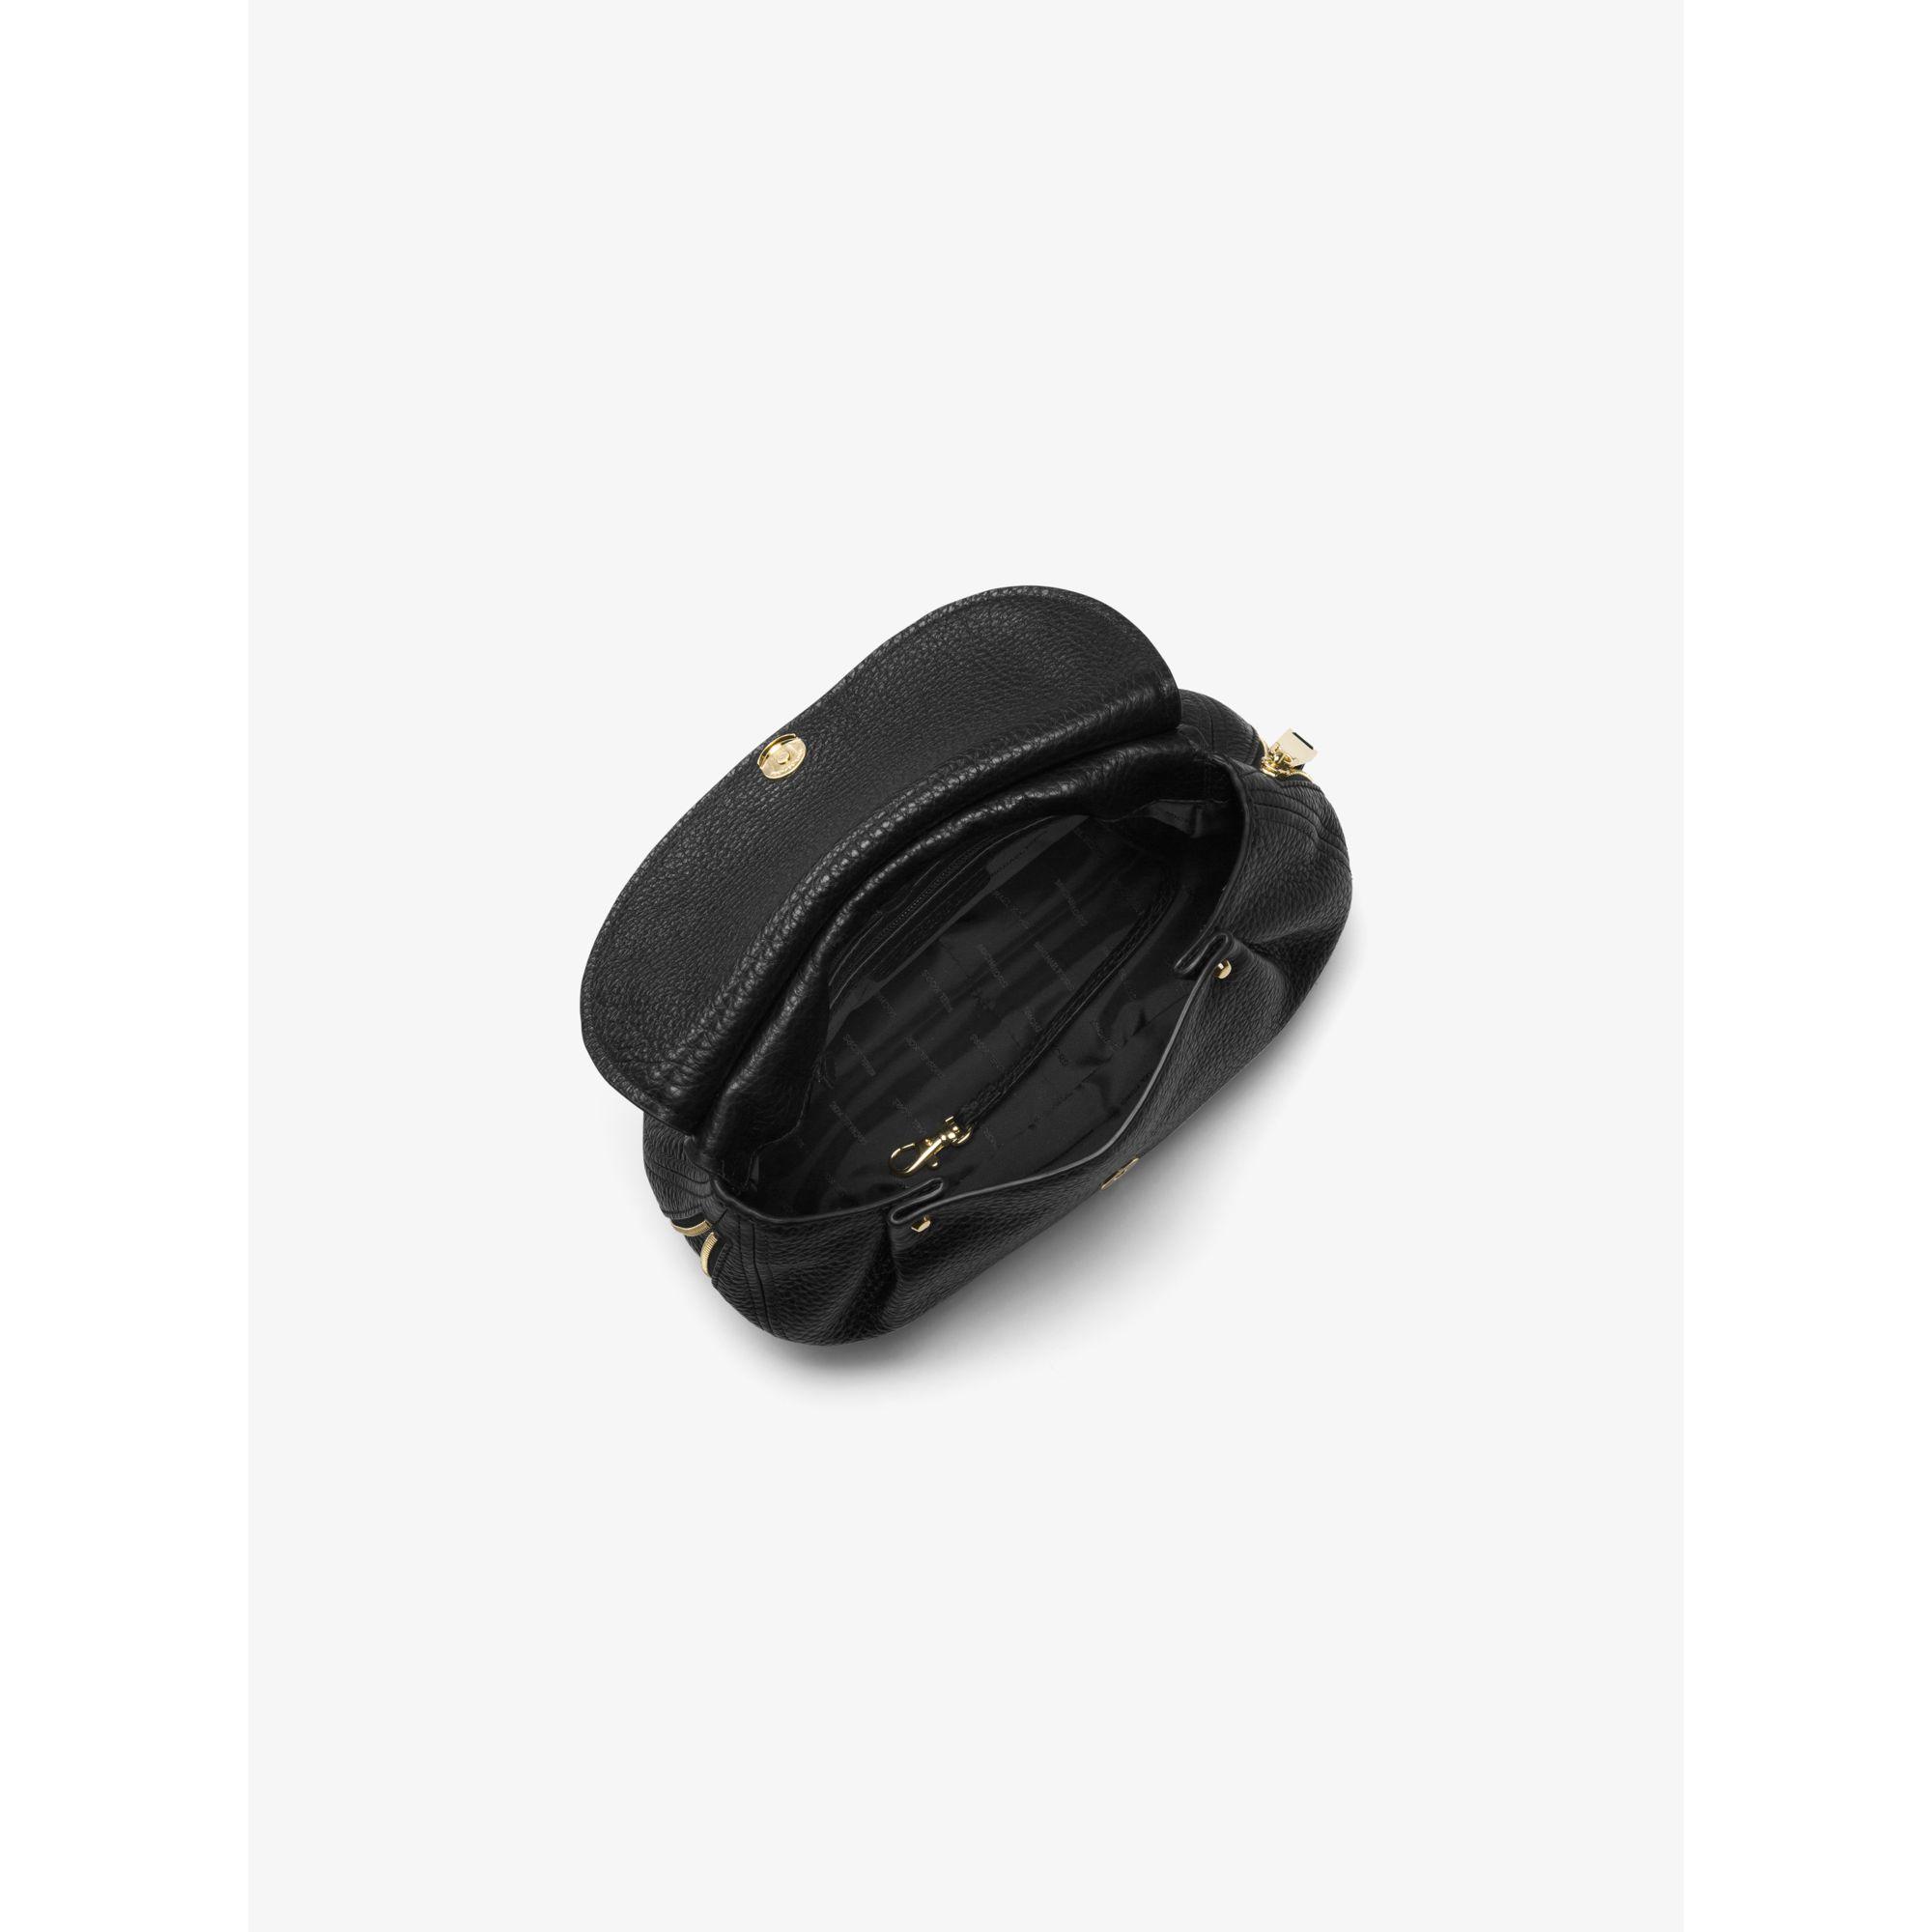 89b2b3238d1b Lyst - Michael Kors Viv Medium Leather Messenger in Black